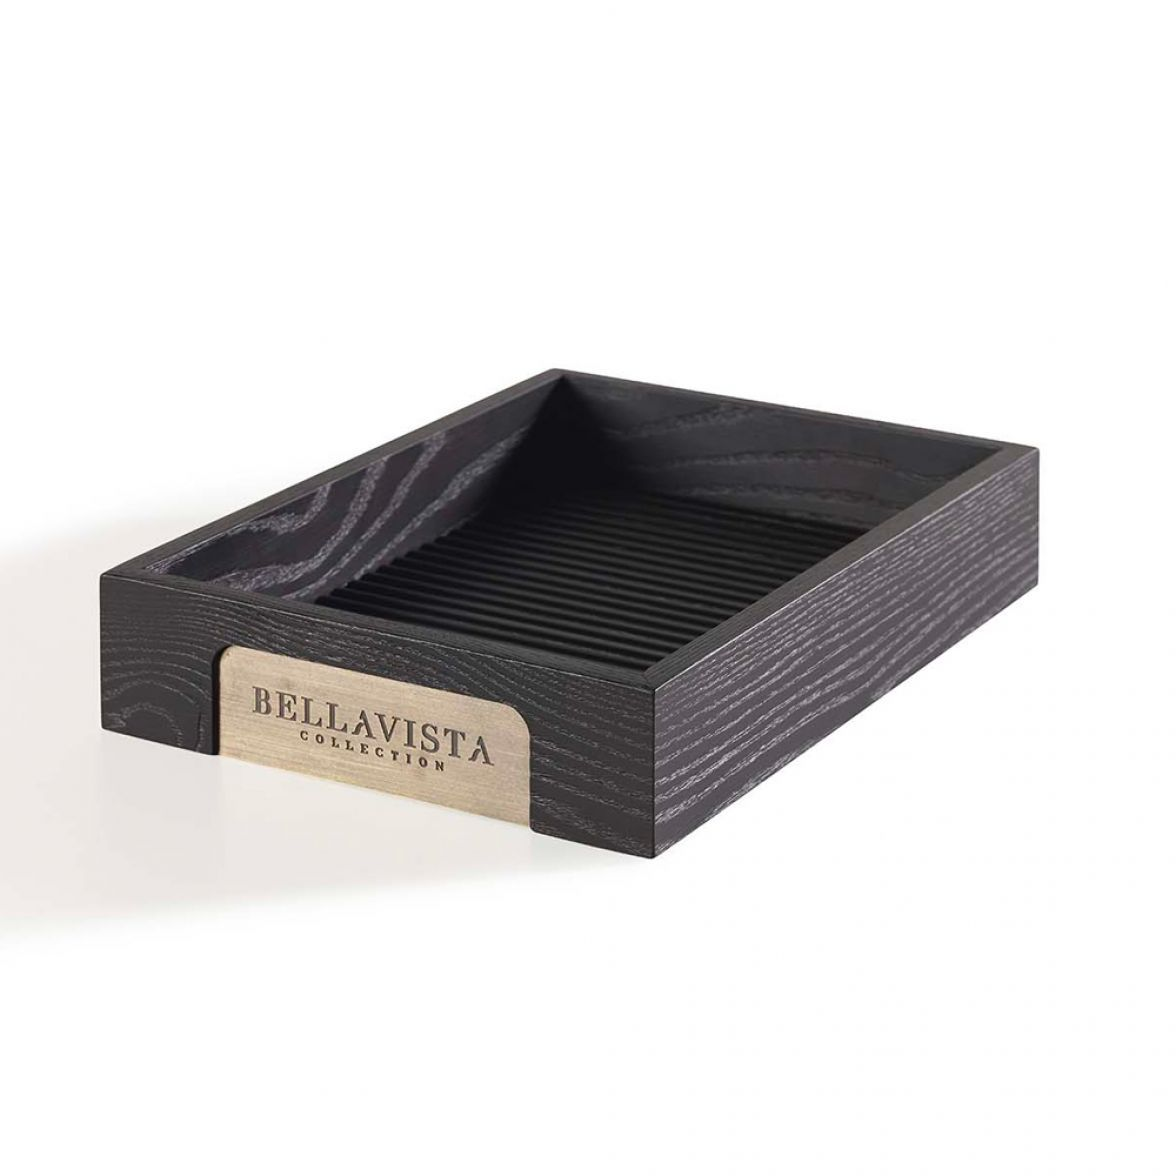 CHAROLITAs tray